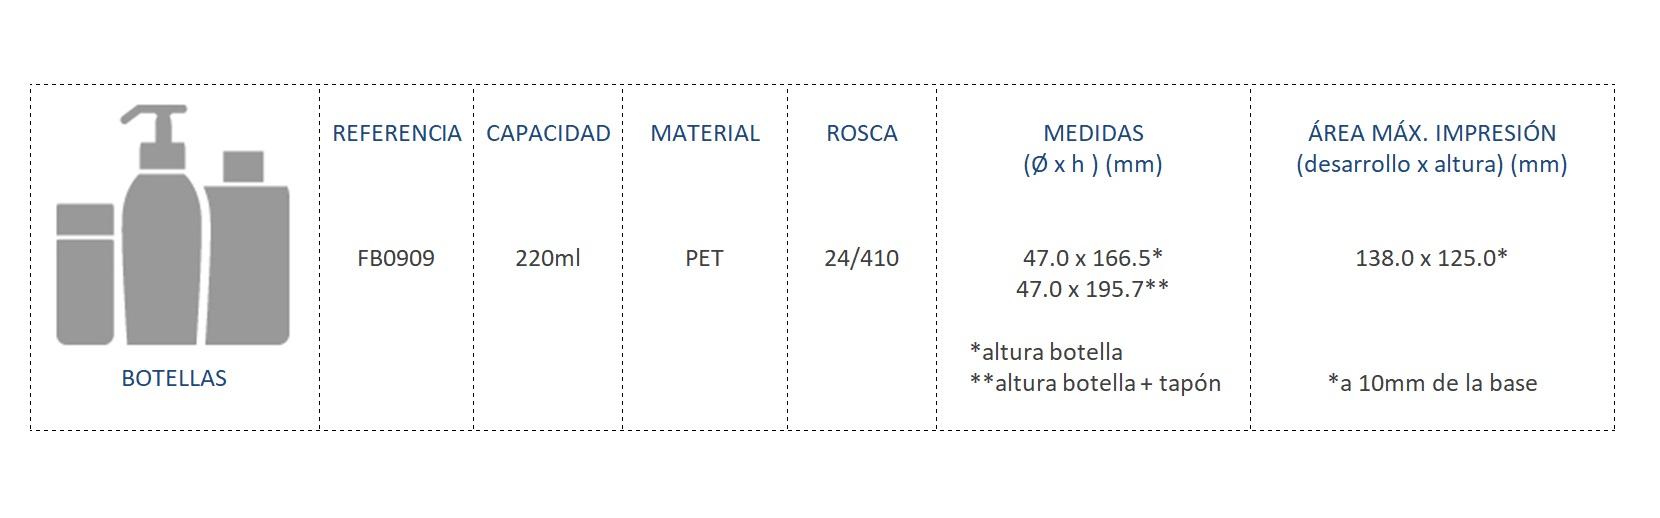 Cuadro de materiales botella FB0909